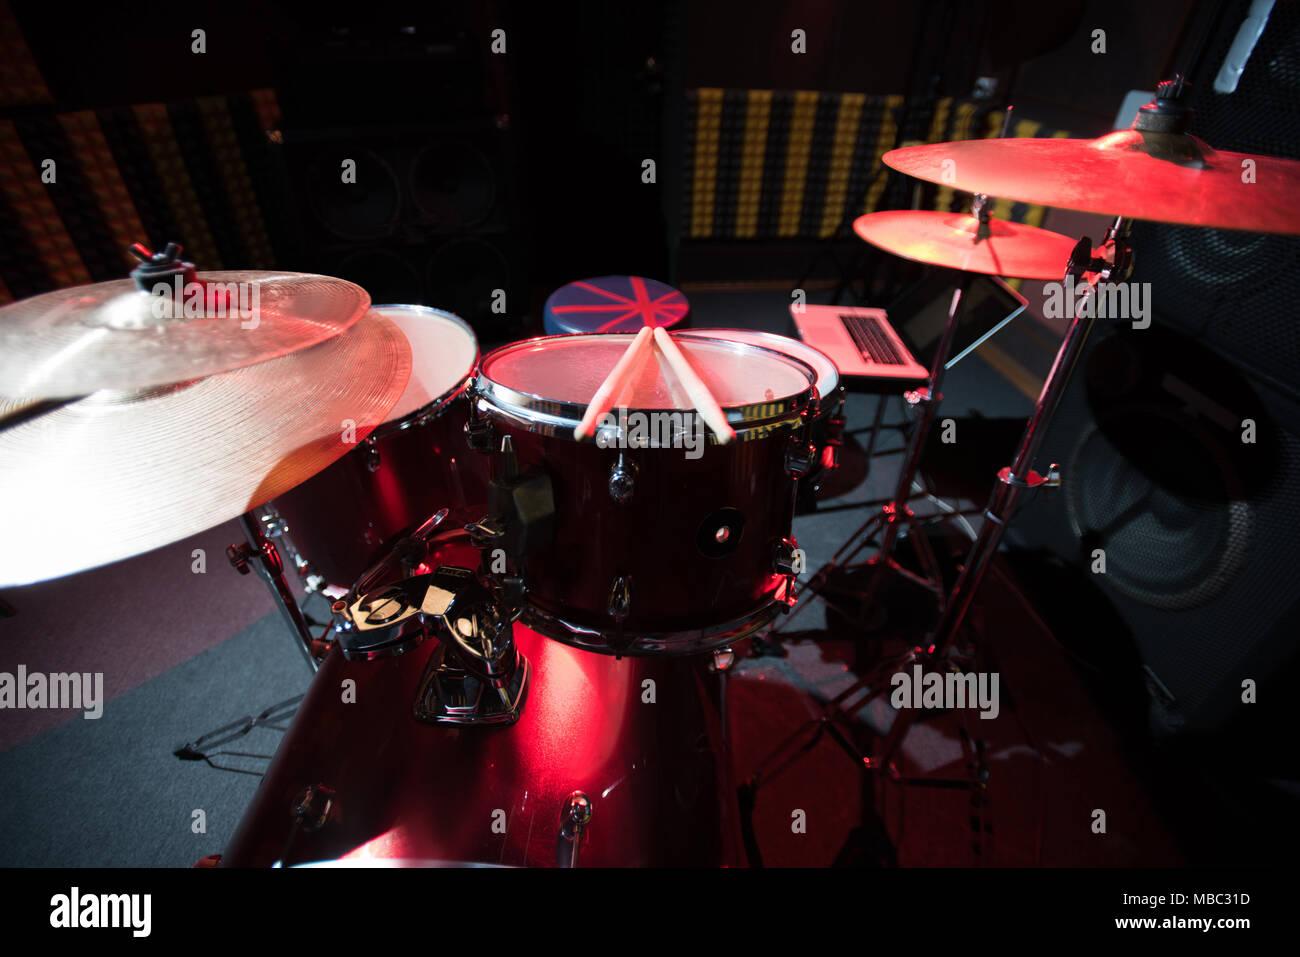 Drum Set On Stage Stock Photo 179130713 Alamy